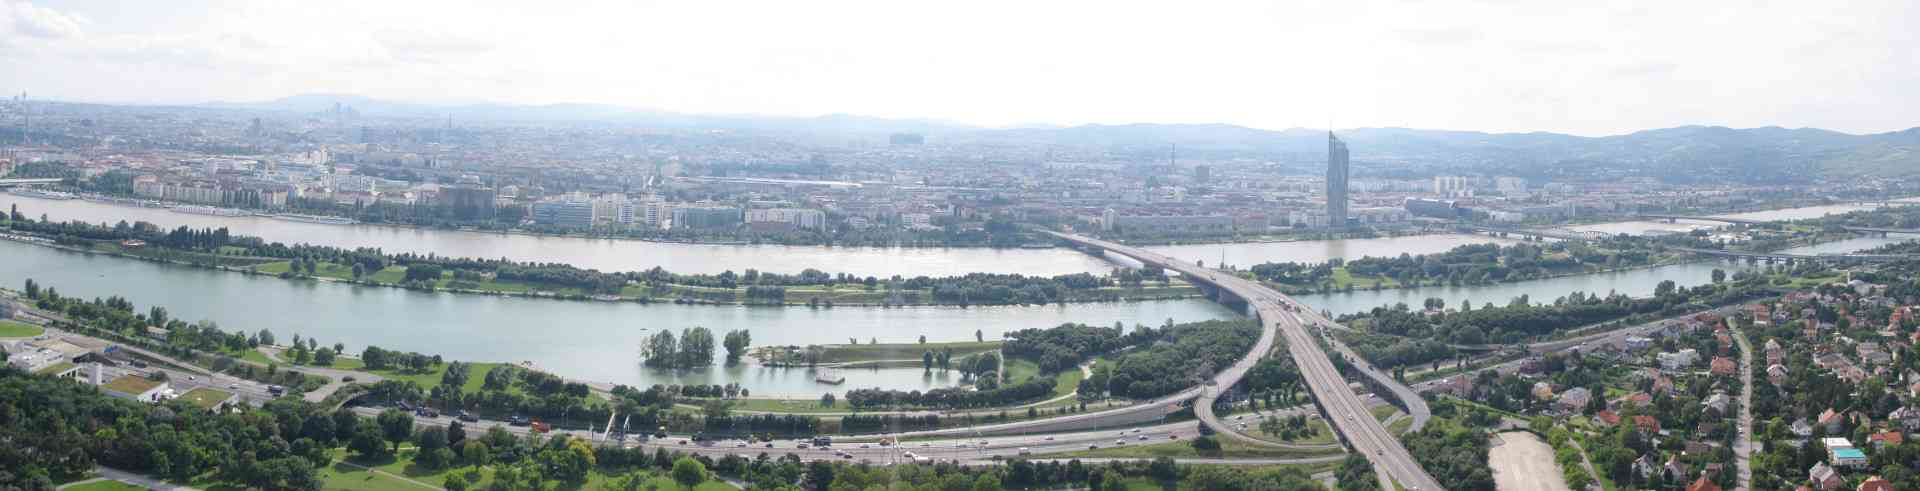 Panorama Wien Donauinsel, Foto: Keule1978, CC BY-SA 3.0